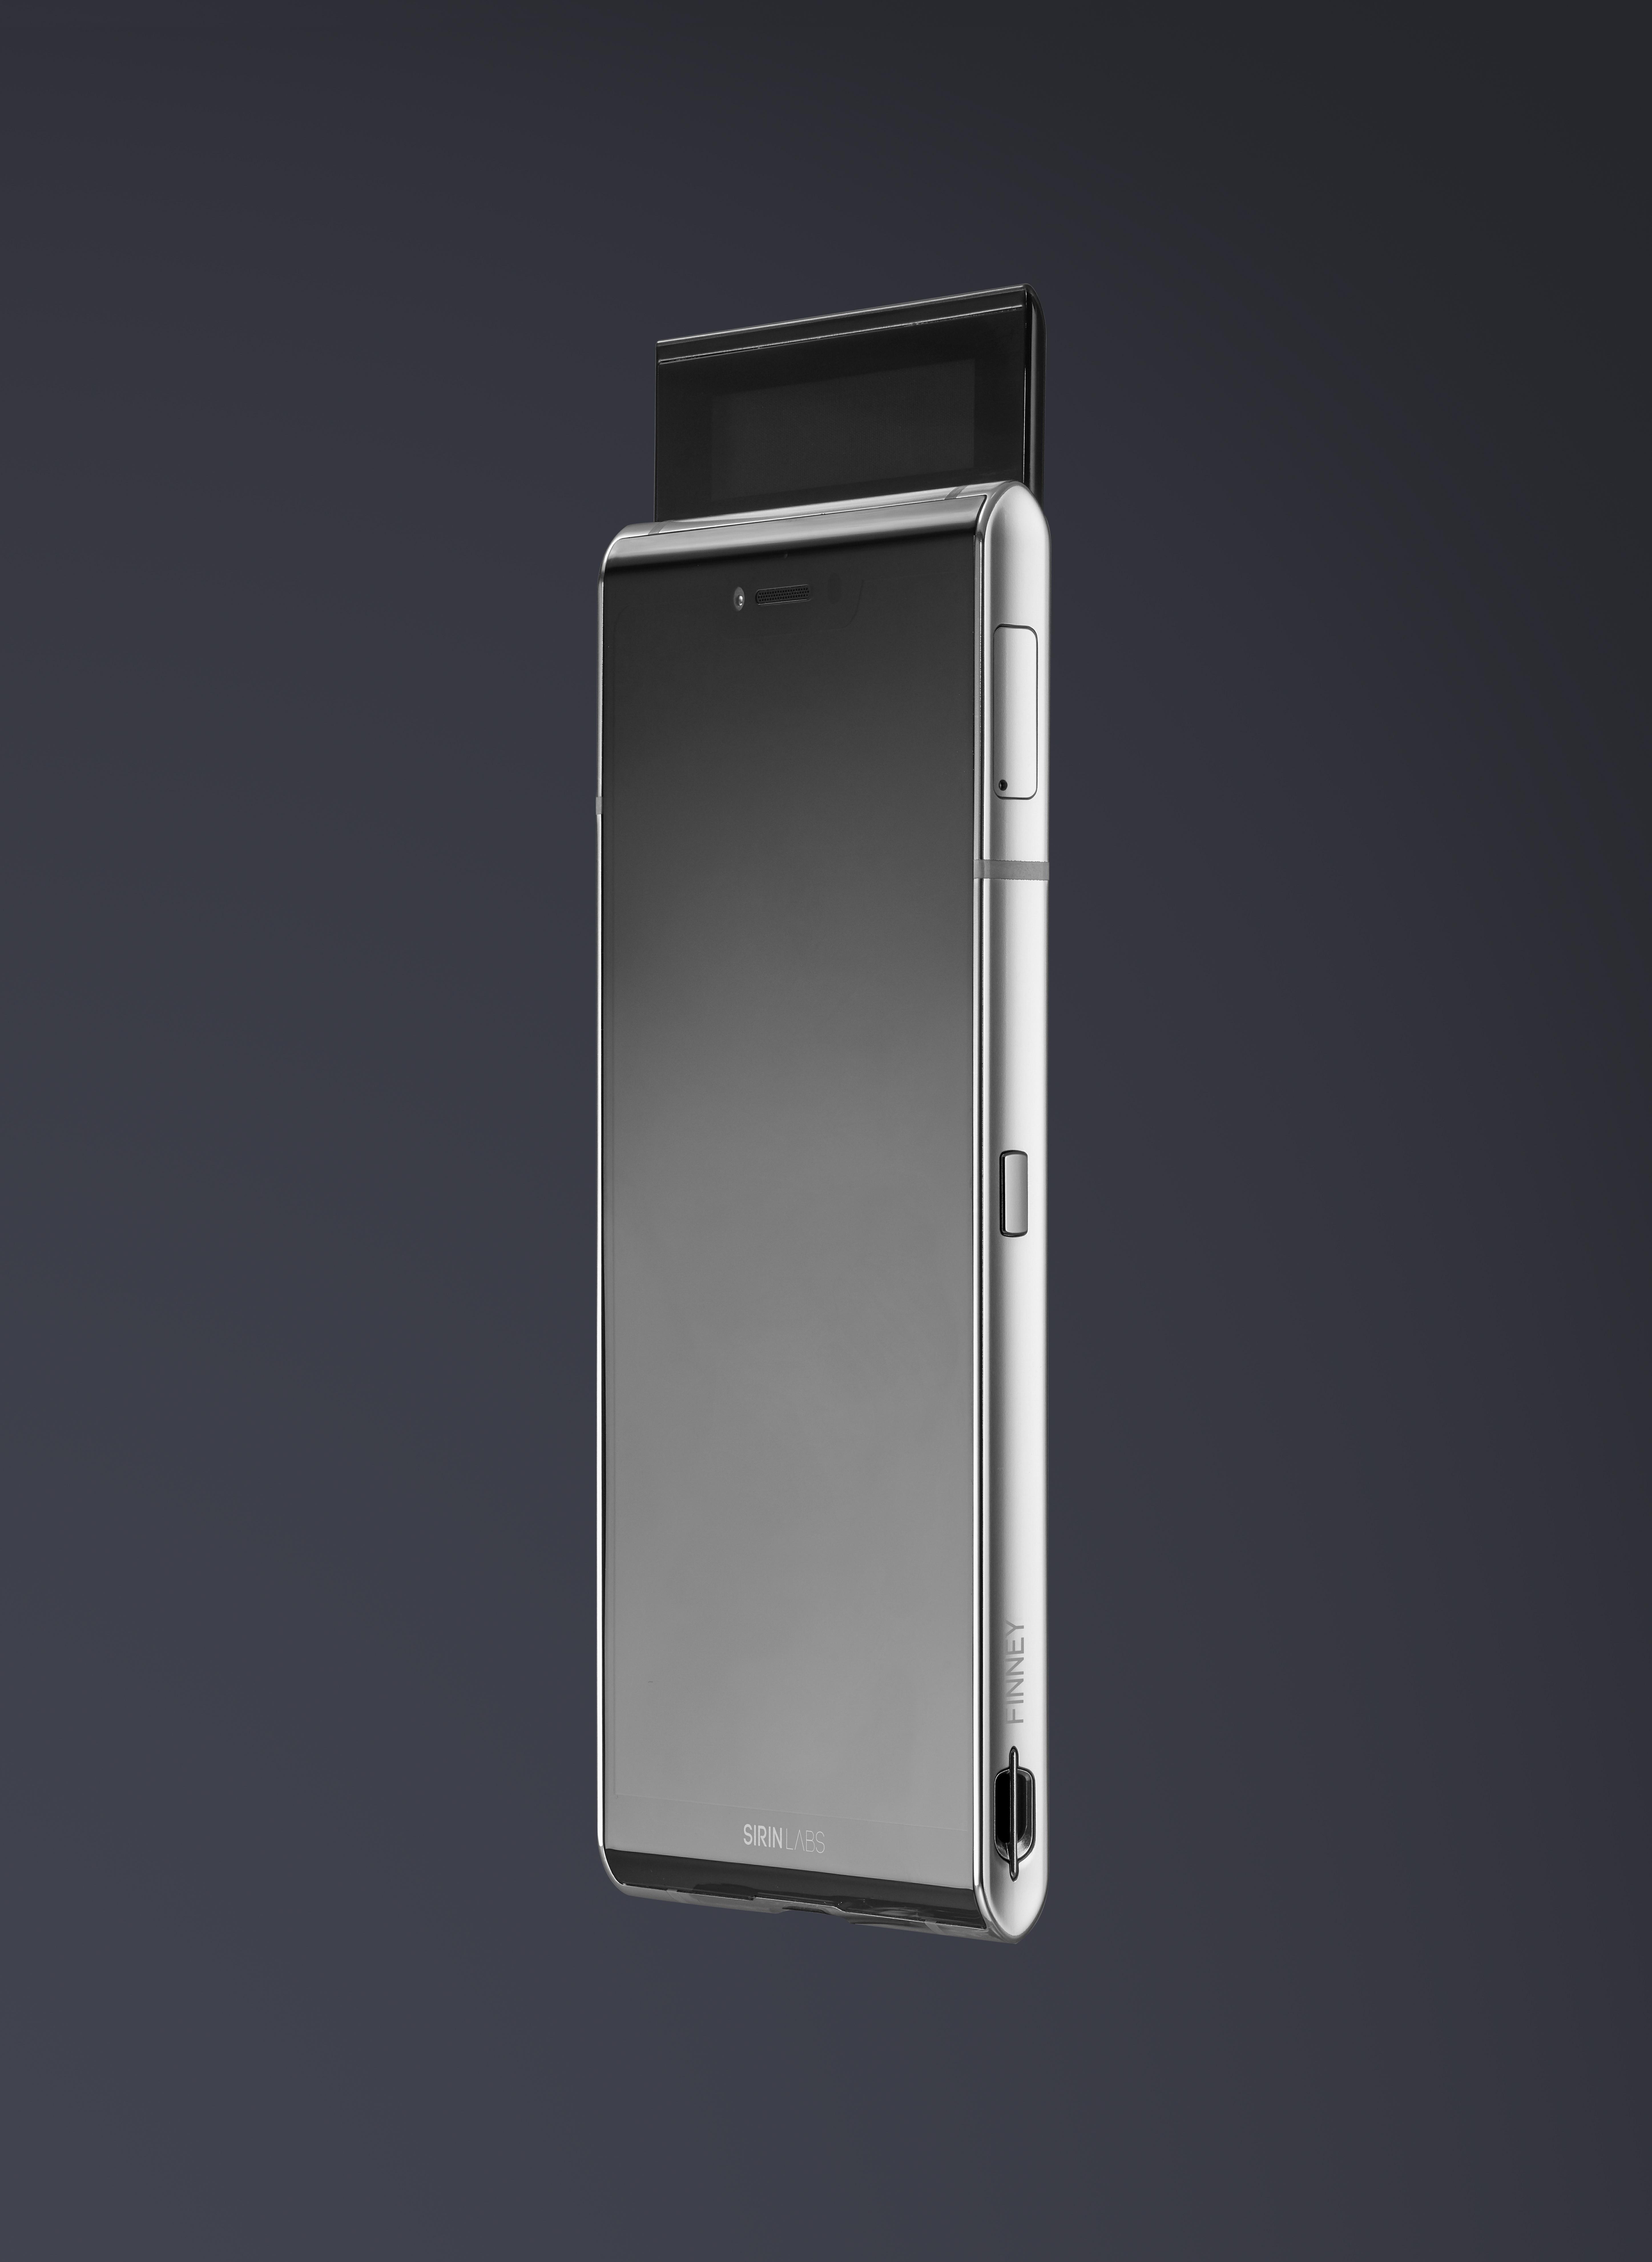 Samsung Galaxy S10 vs Sirin Finney phone